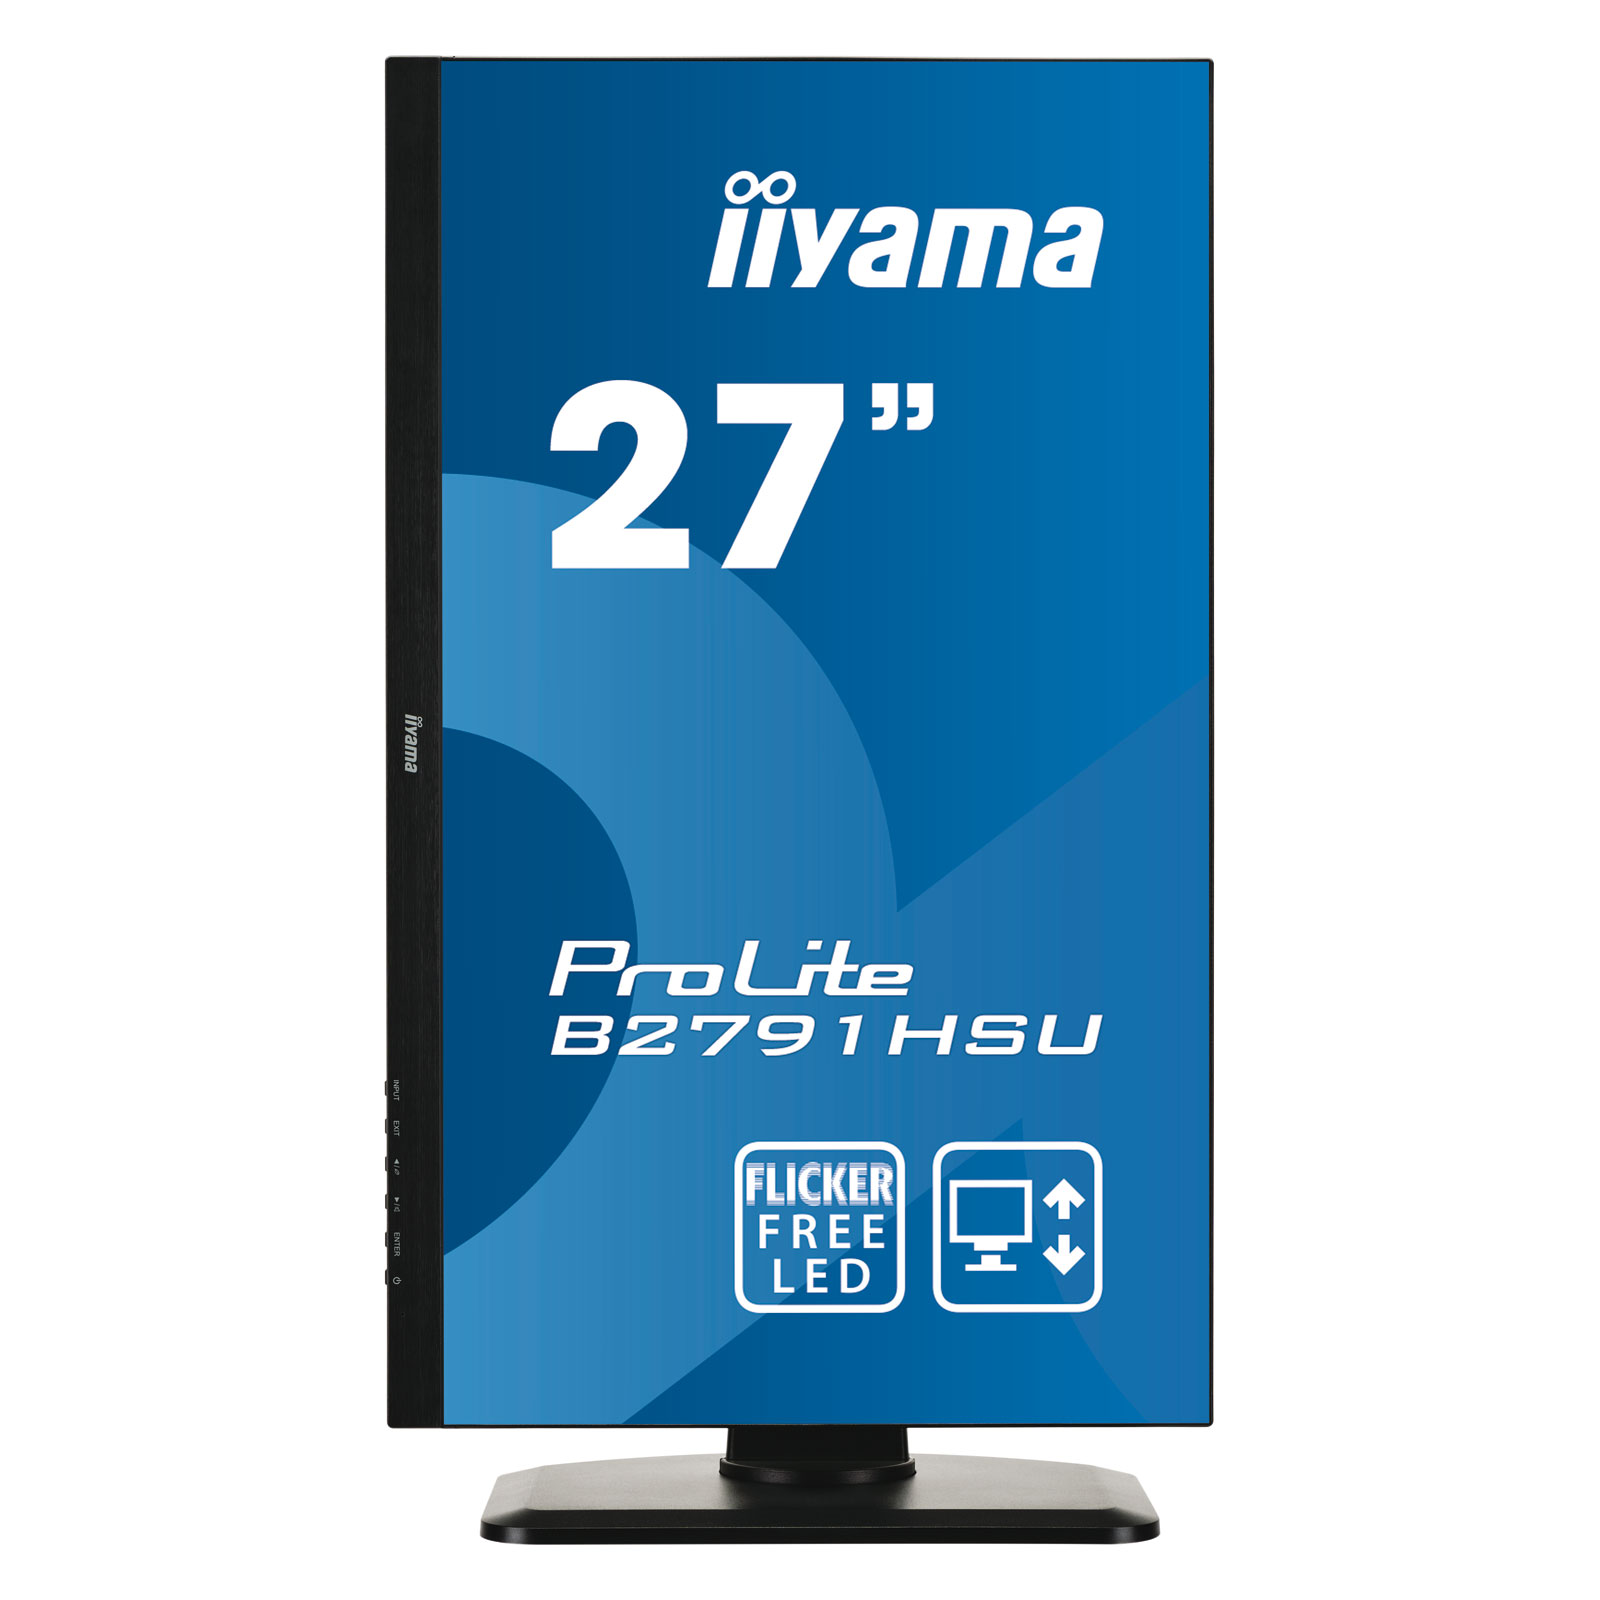 Iiyama 27 led b2791hsu b1 ecran pc iiyama sur for Ecran photo 24 ou 27